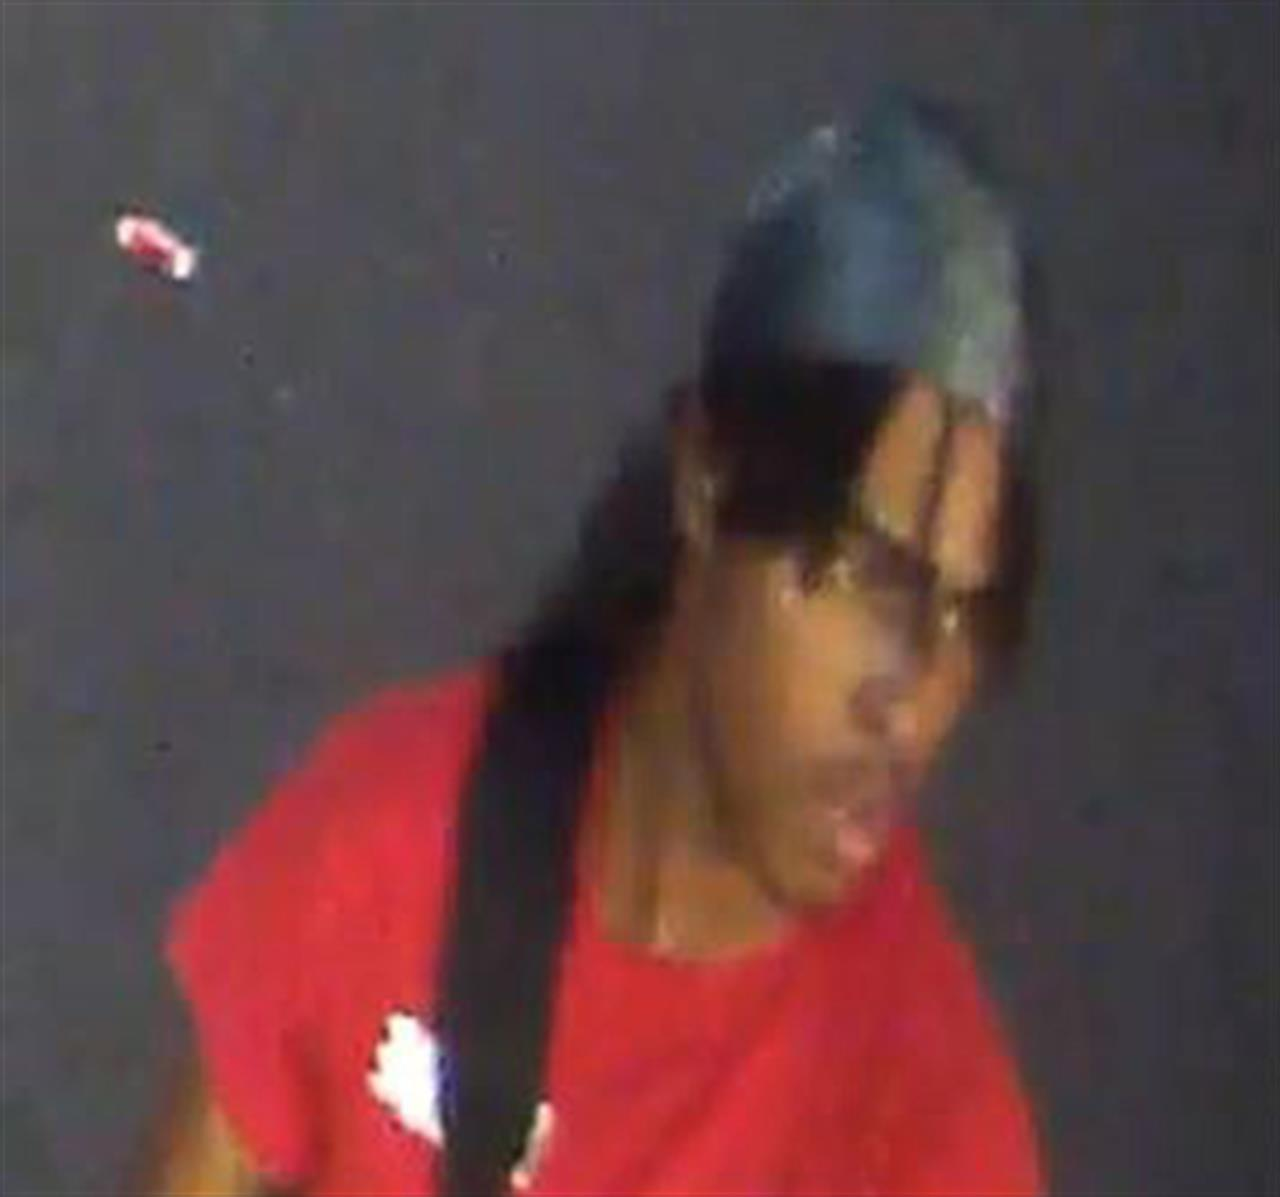 Parents of slain Atlanta girl plead for help to find killer